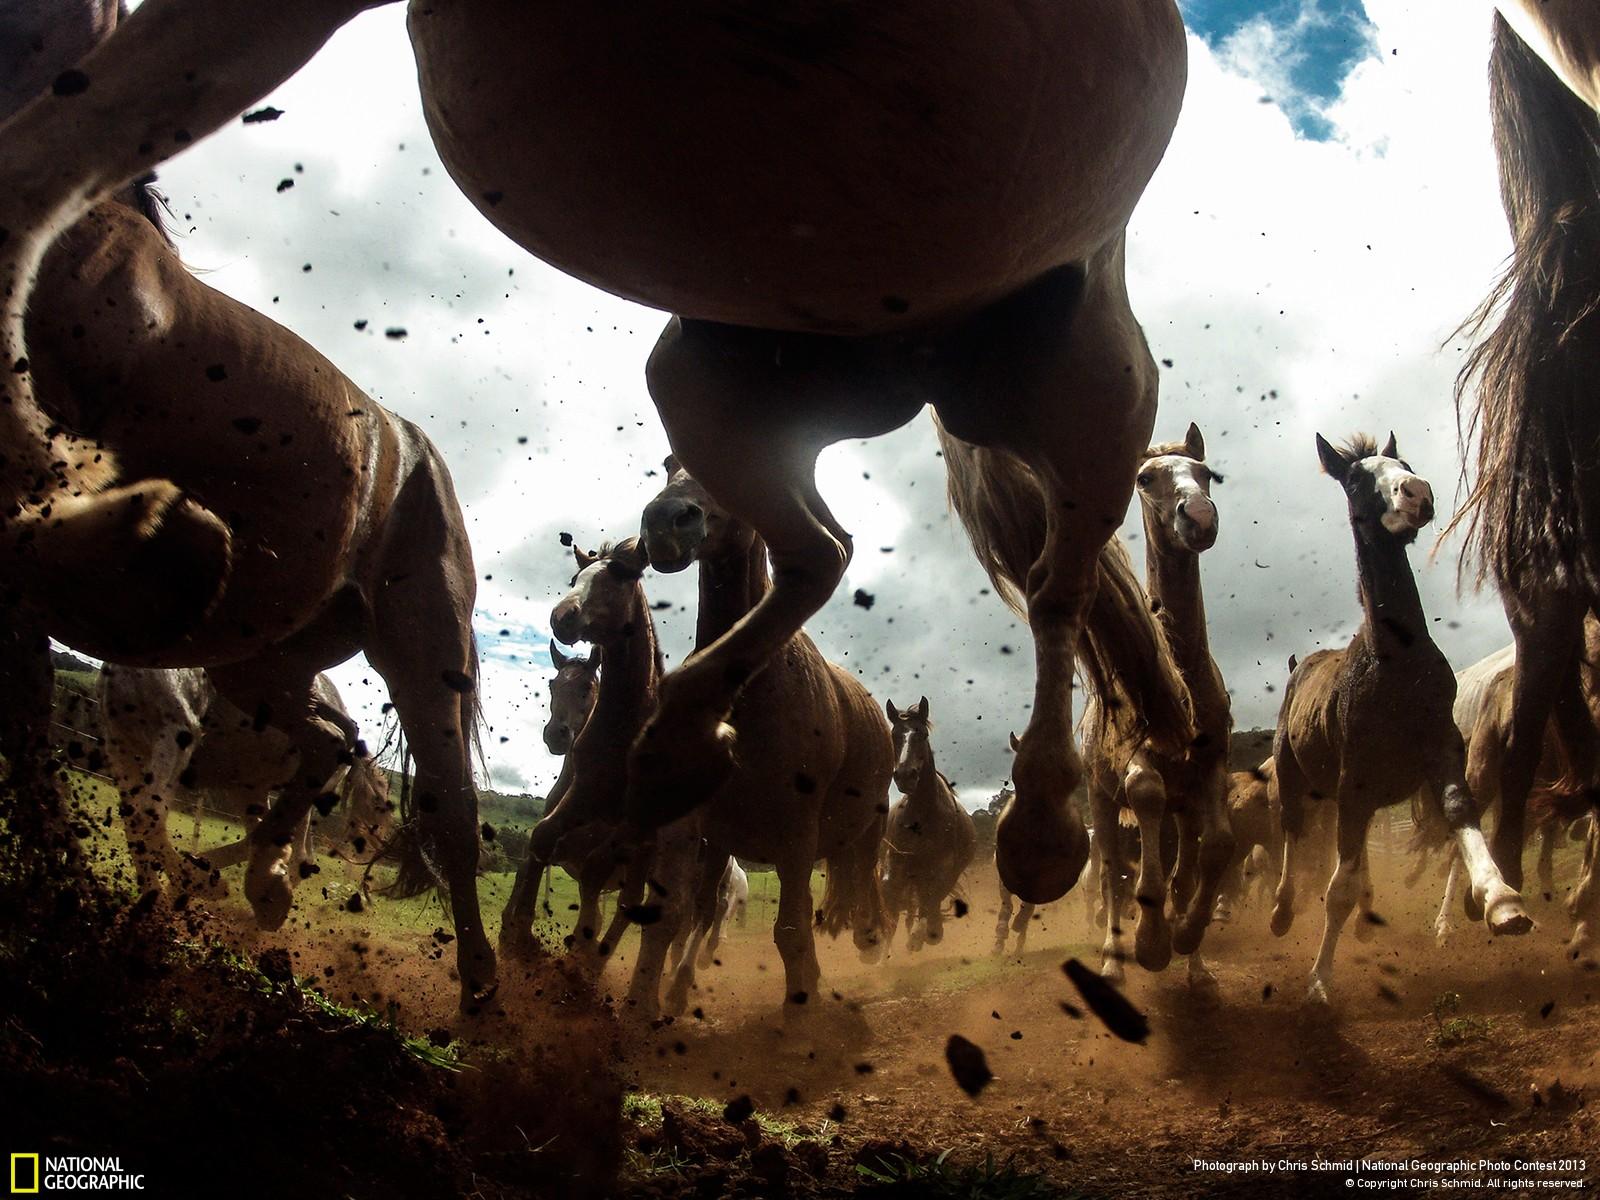 National Geographic best photos las mejores fotos del 2013 (5)